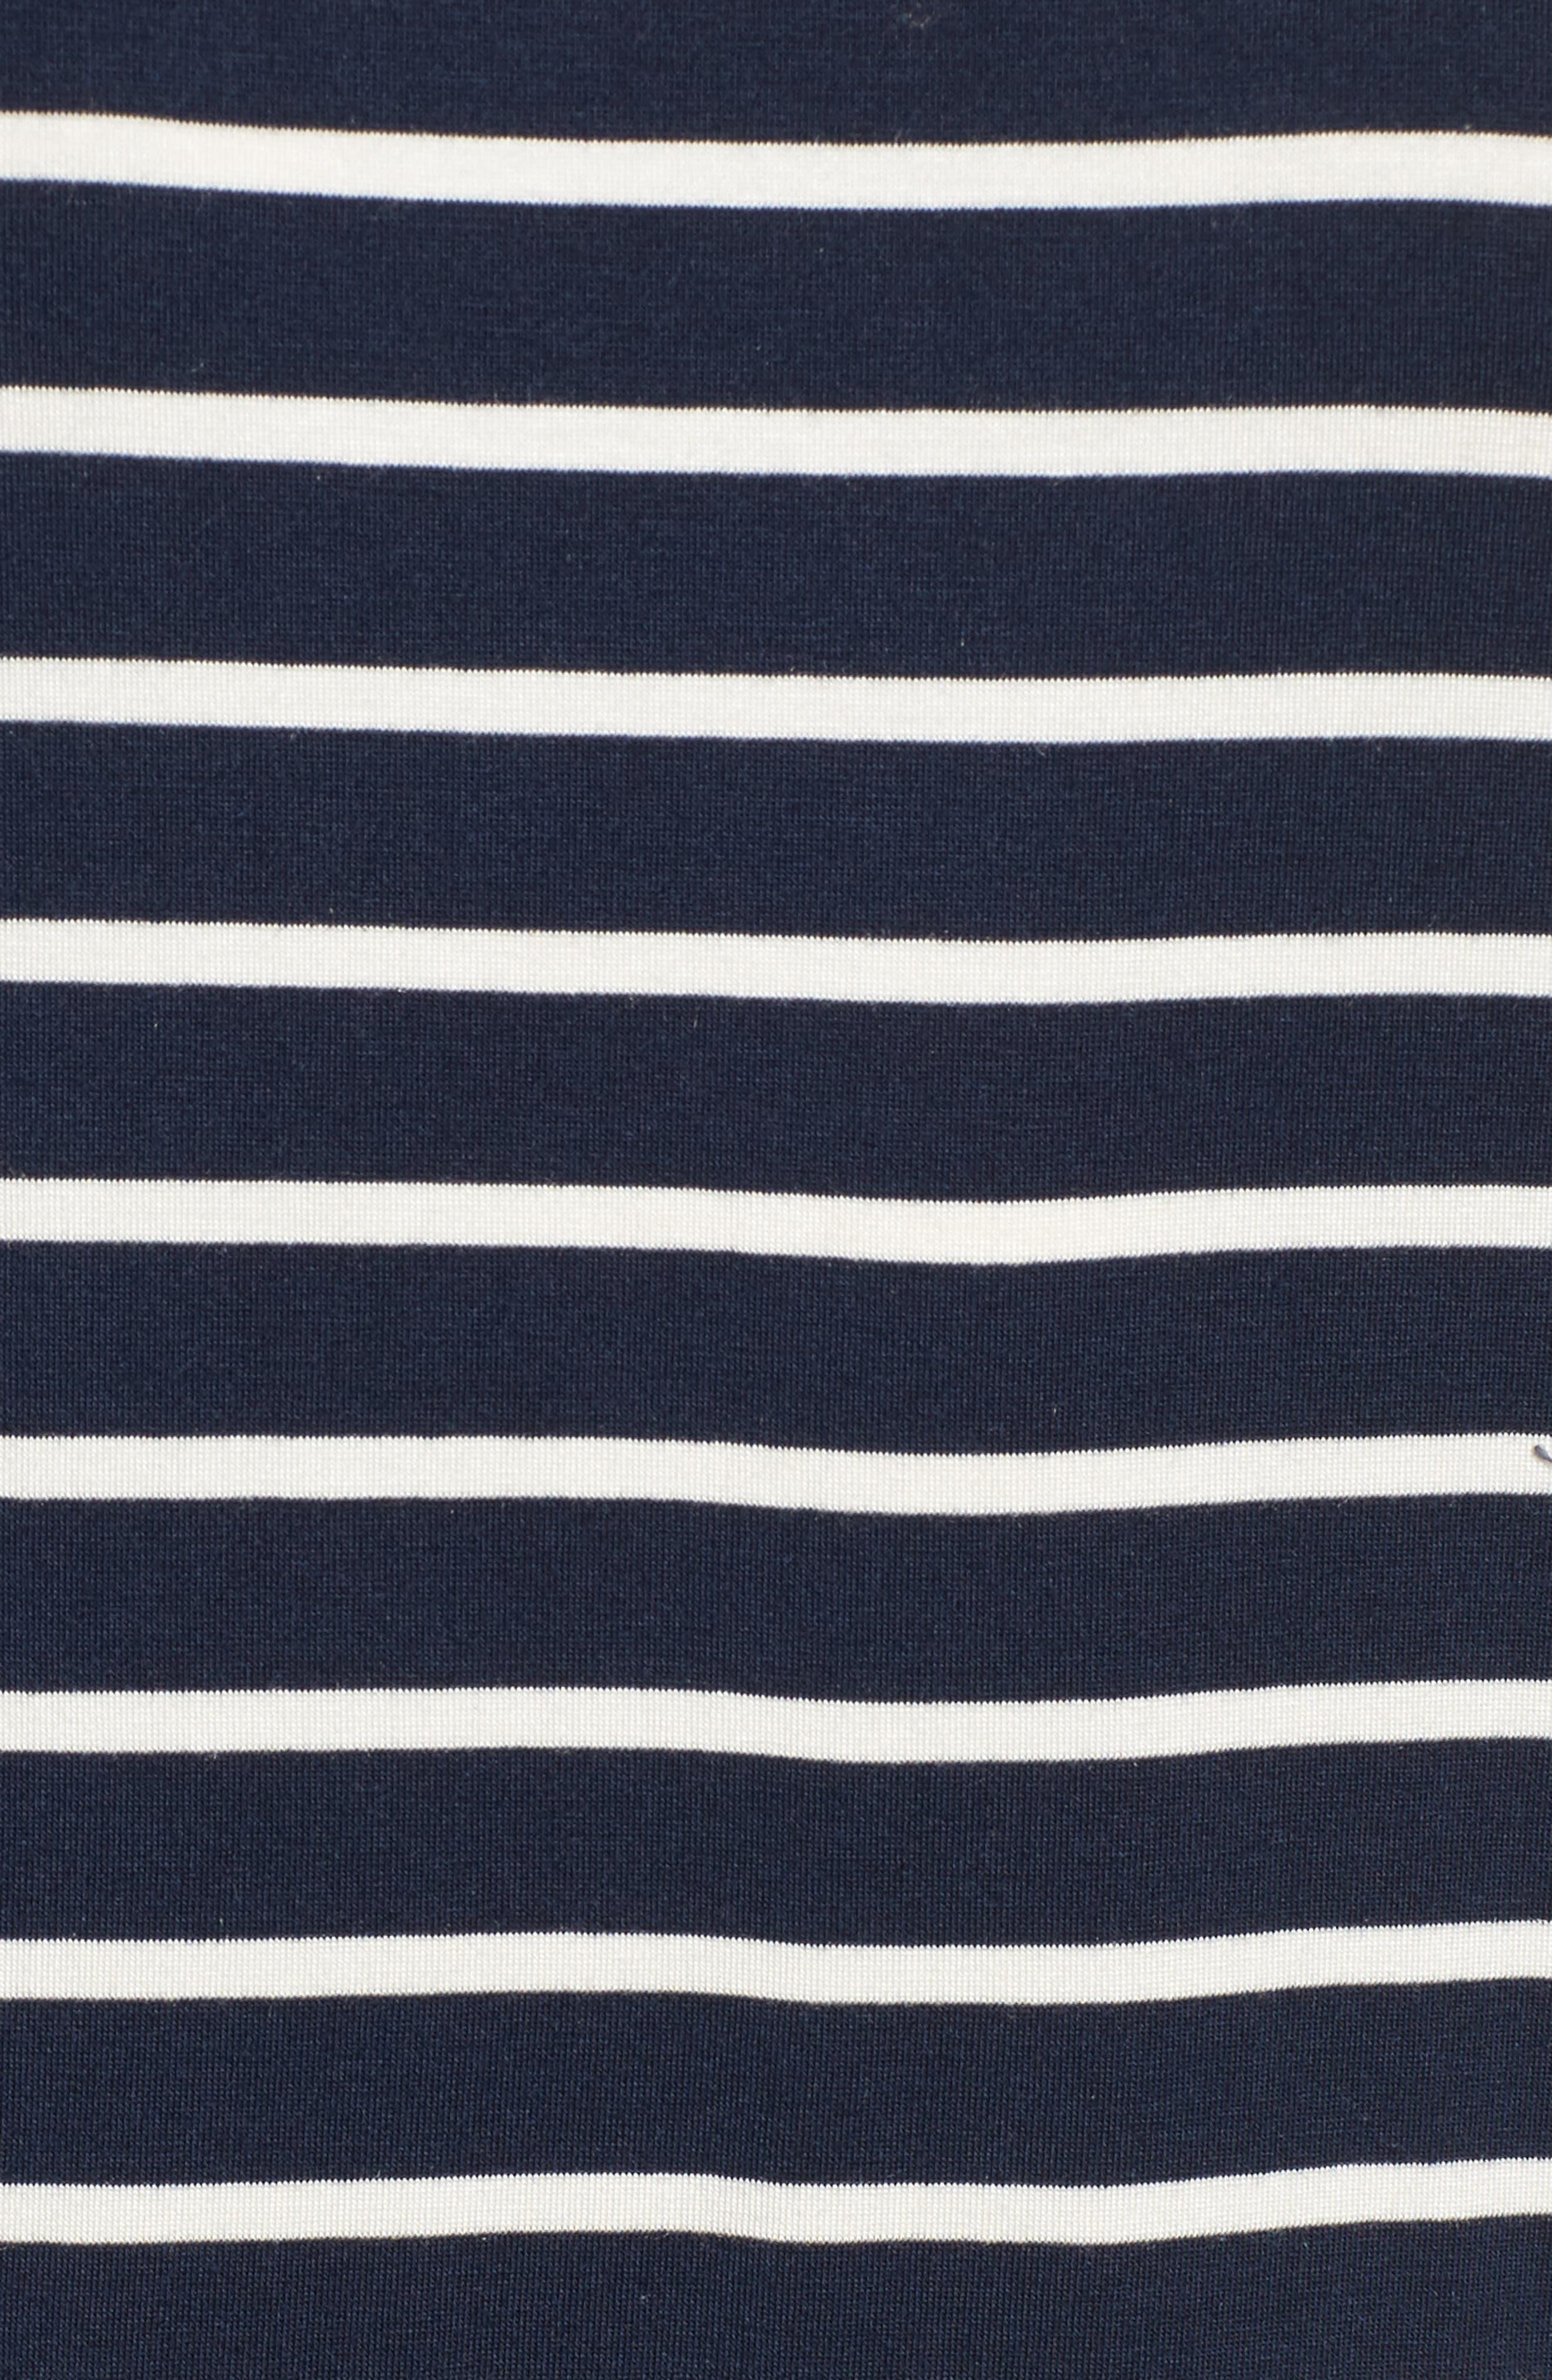 Rafaela Knit Dress,                             Alternate thumbnail 5, color,                             Basque